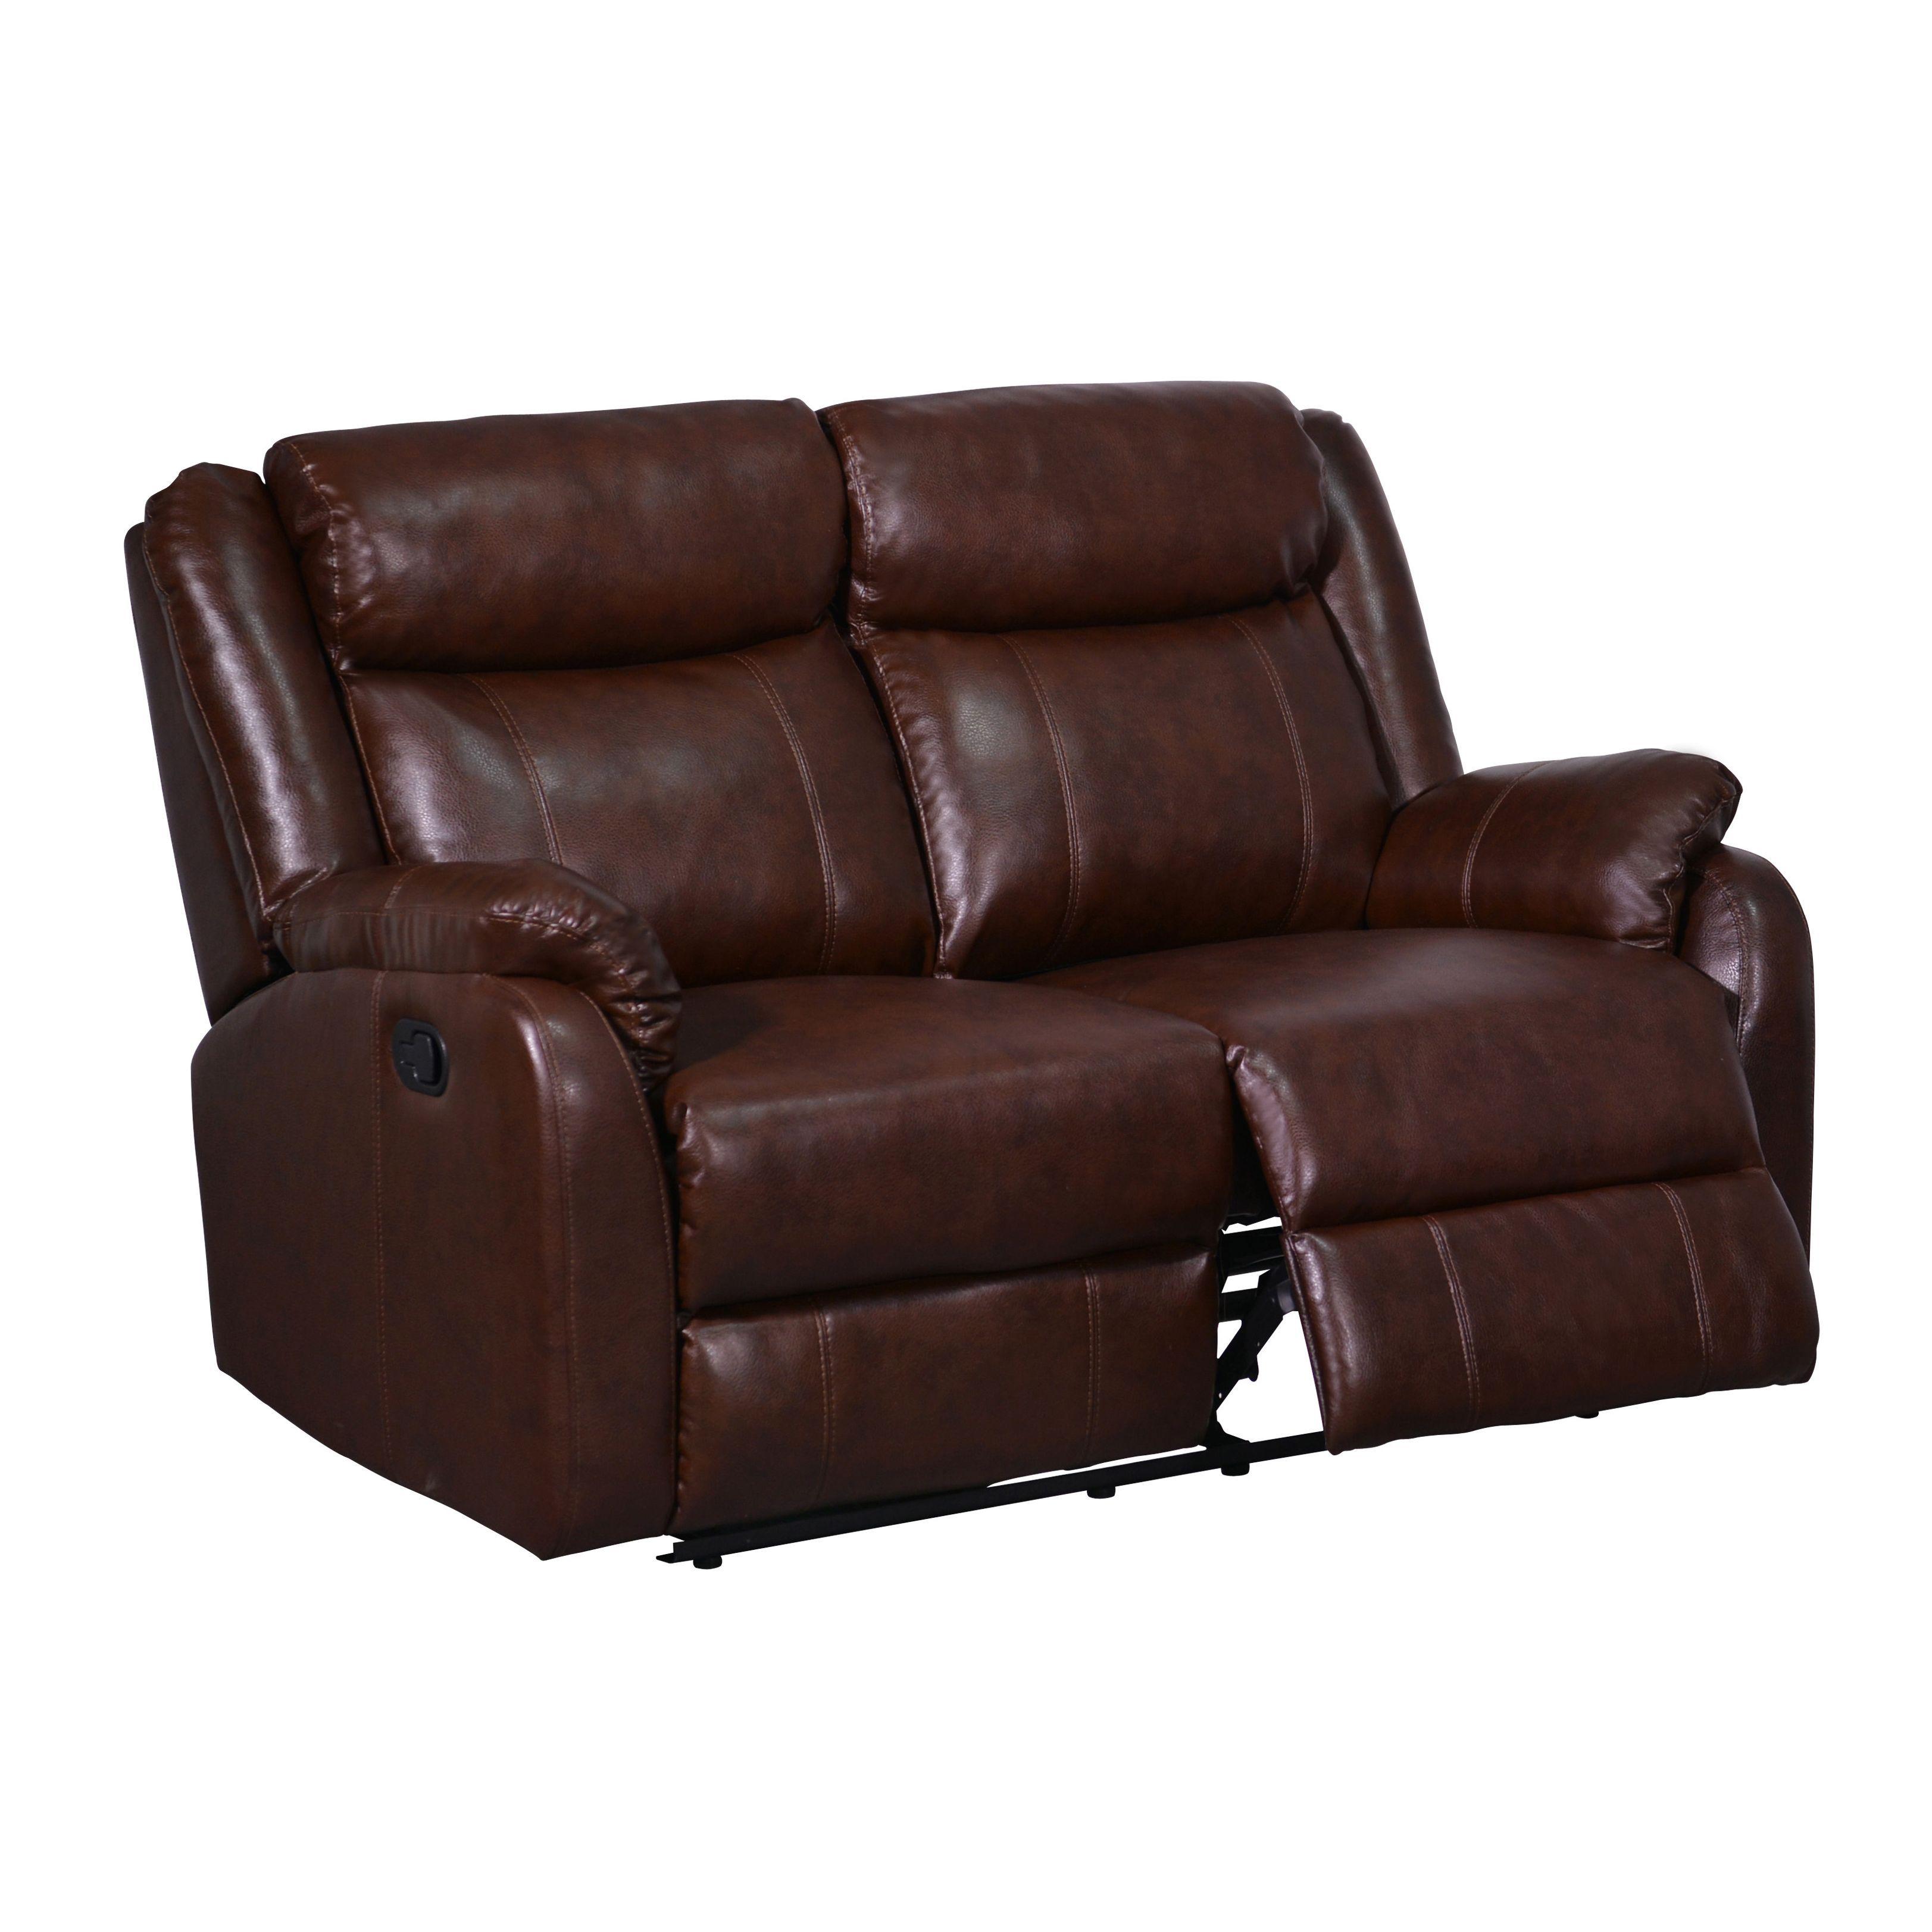 room leather augusta savannah living comfortable charleston catnapper loveseat brands brantley comforter